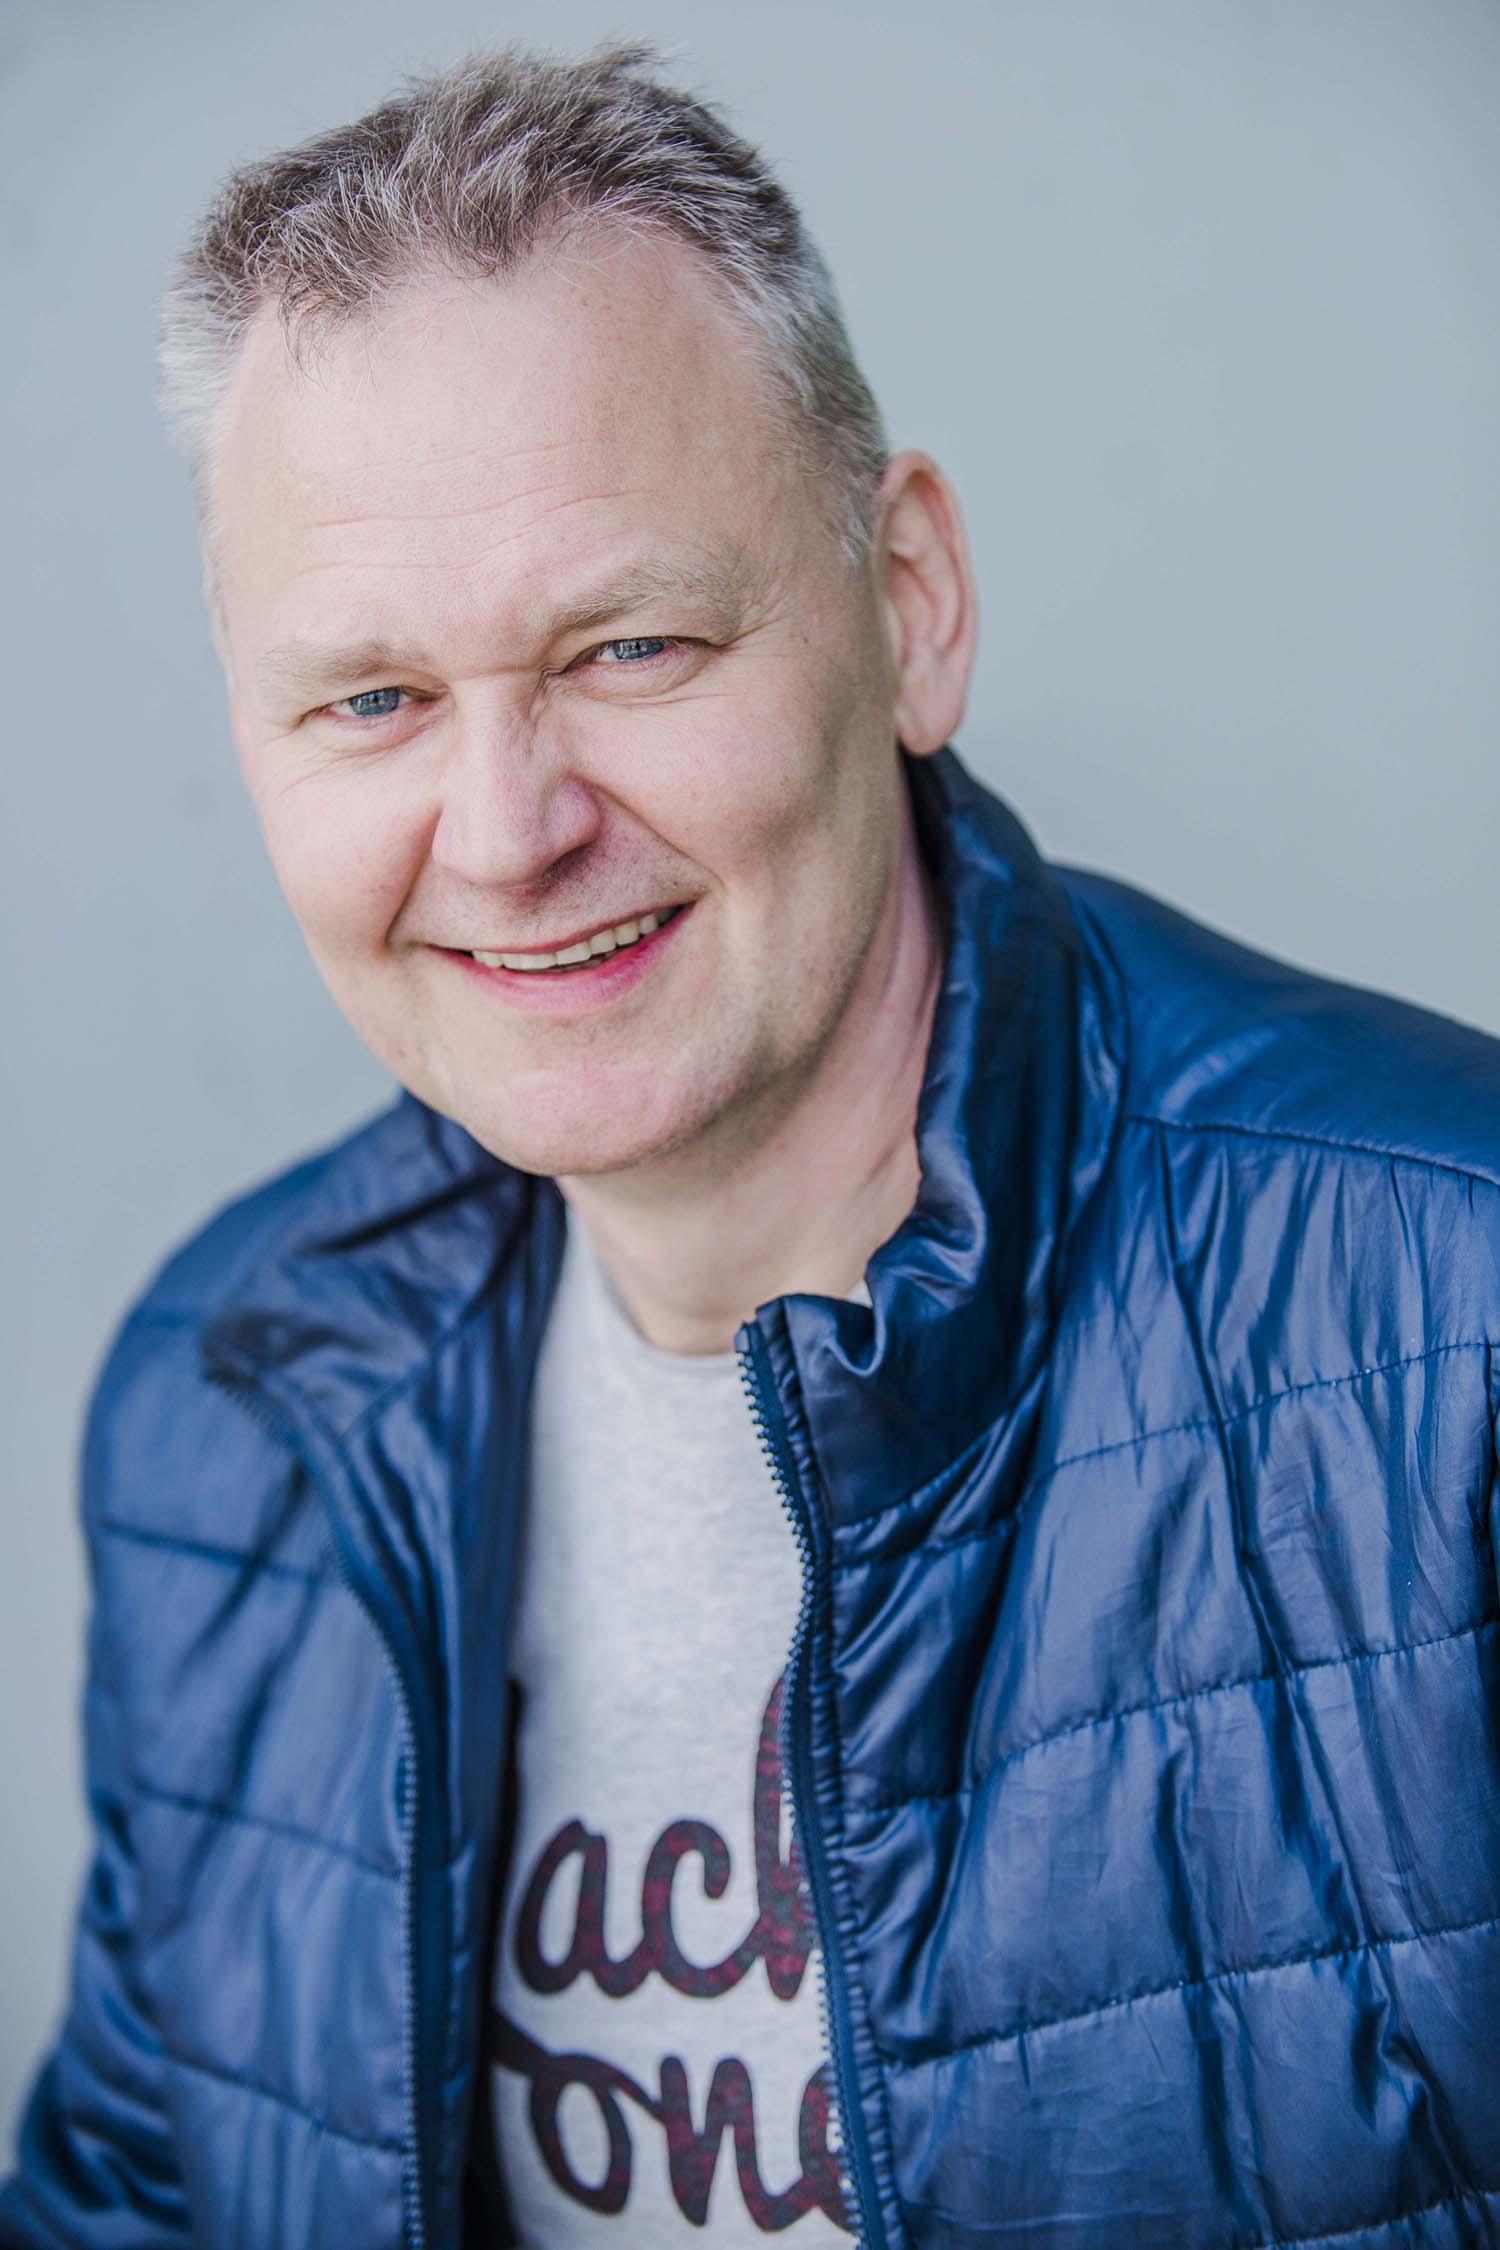 Gert Jan Bron